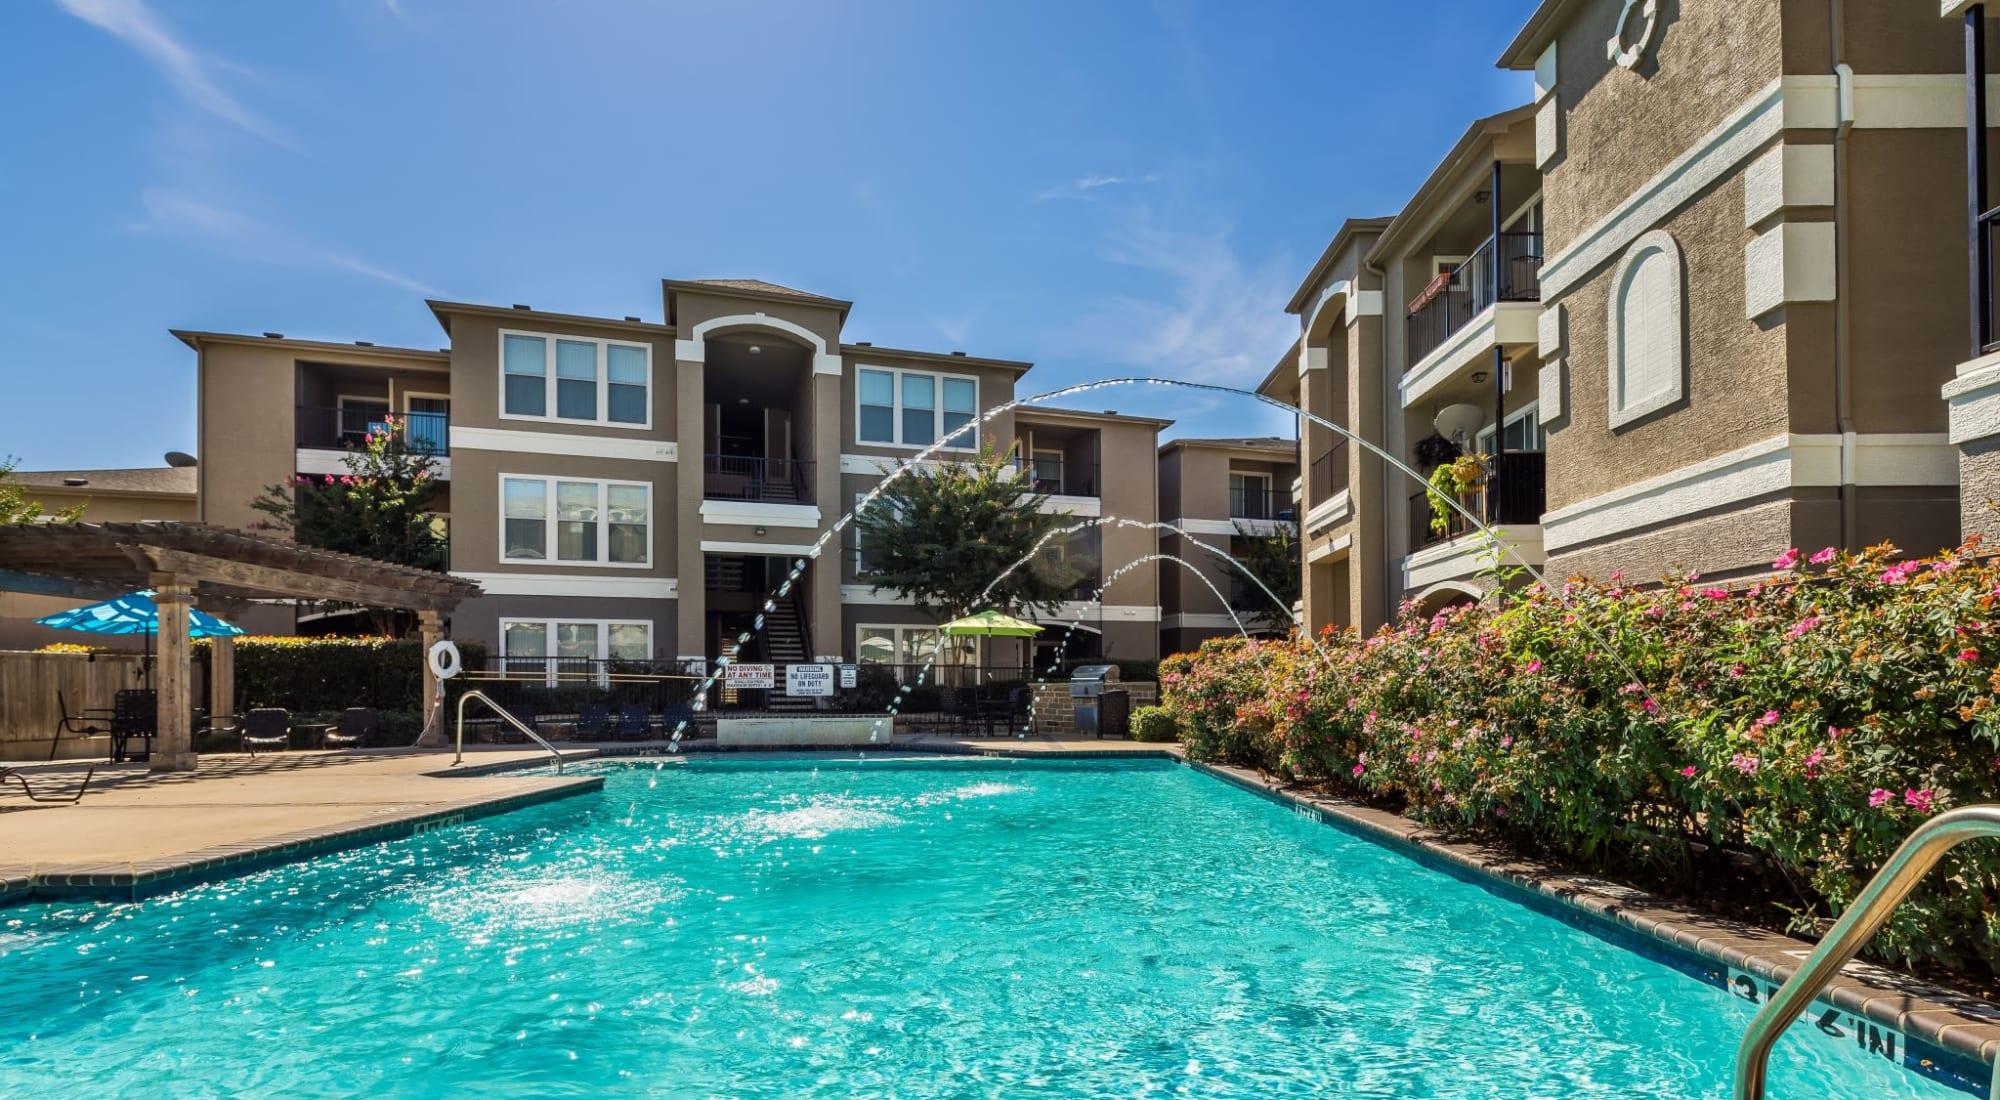 Apartments at Vail Quarters in Dallas, Texas